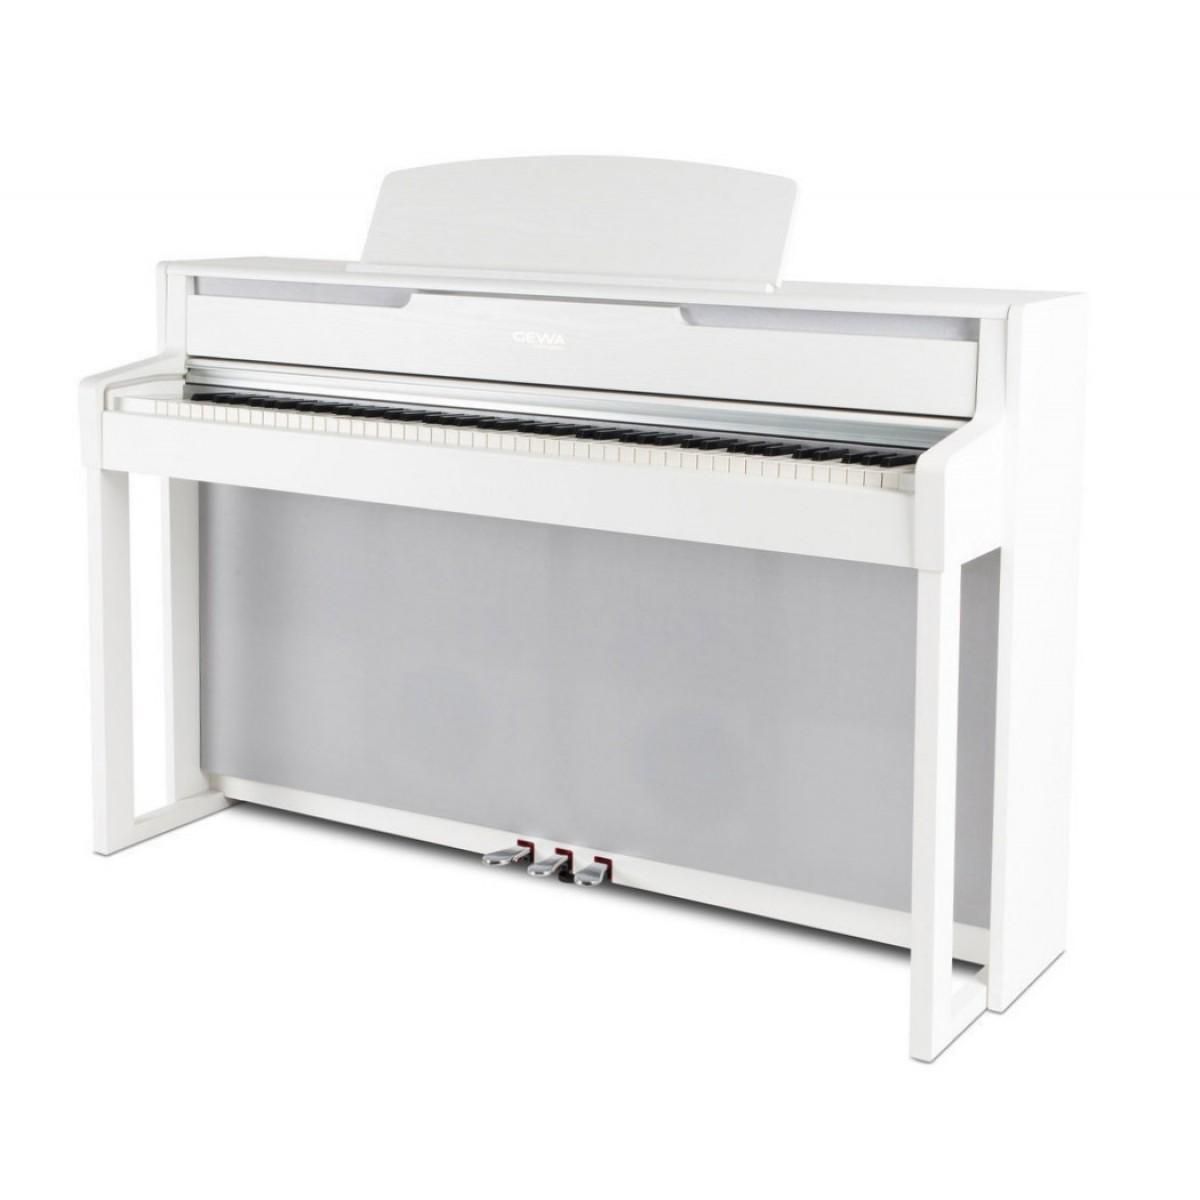 GEWA Digital Piano UP 400 Weiss